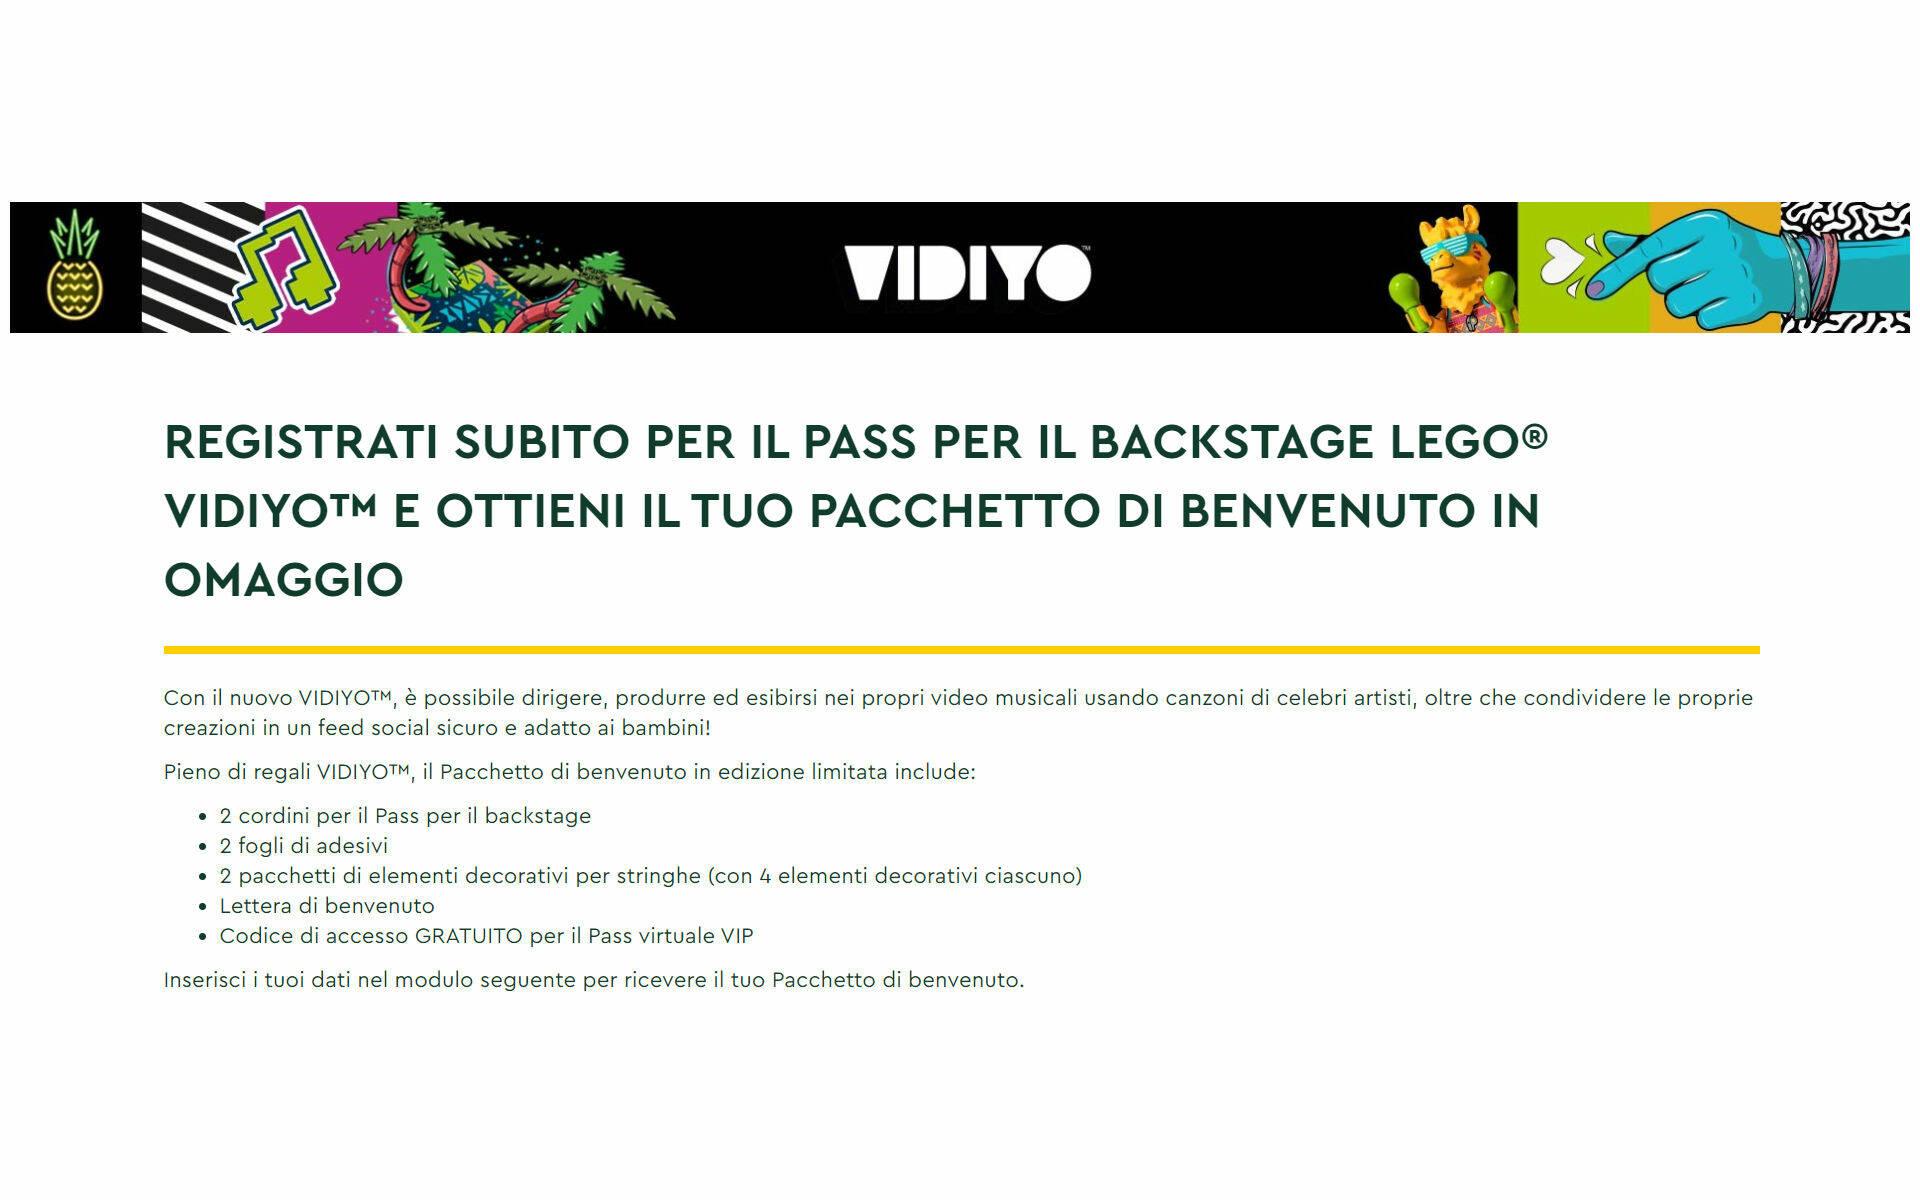 LEGO VIDIYO UFFICIALE